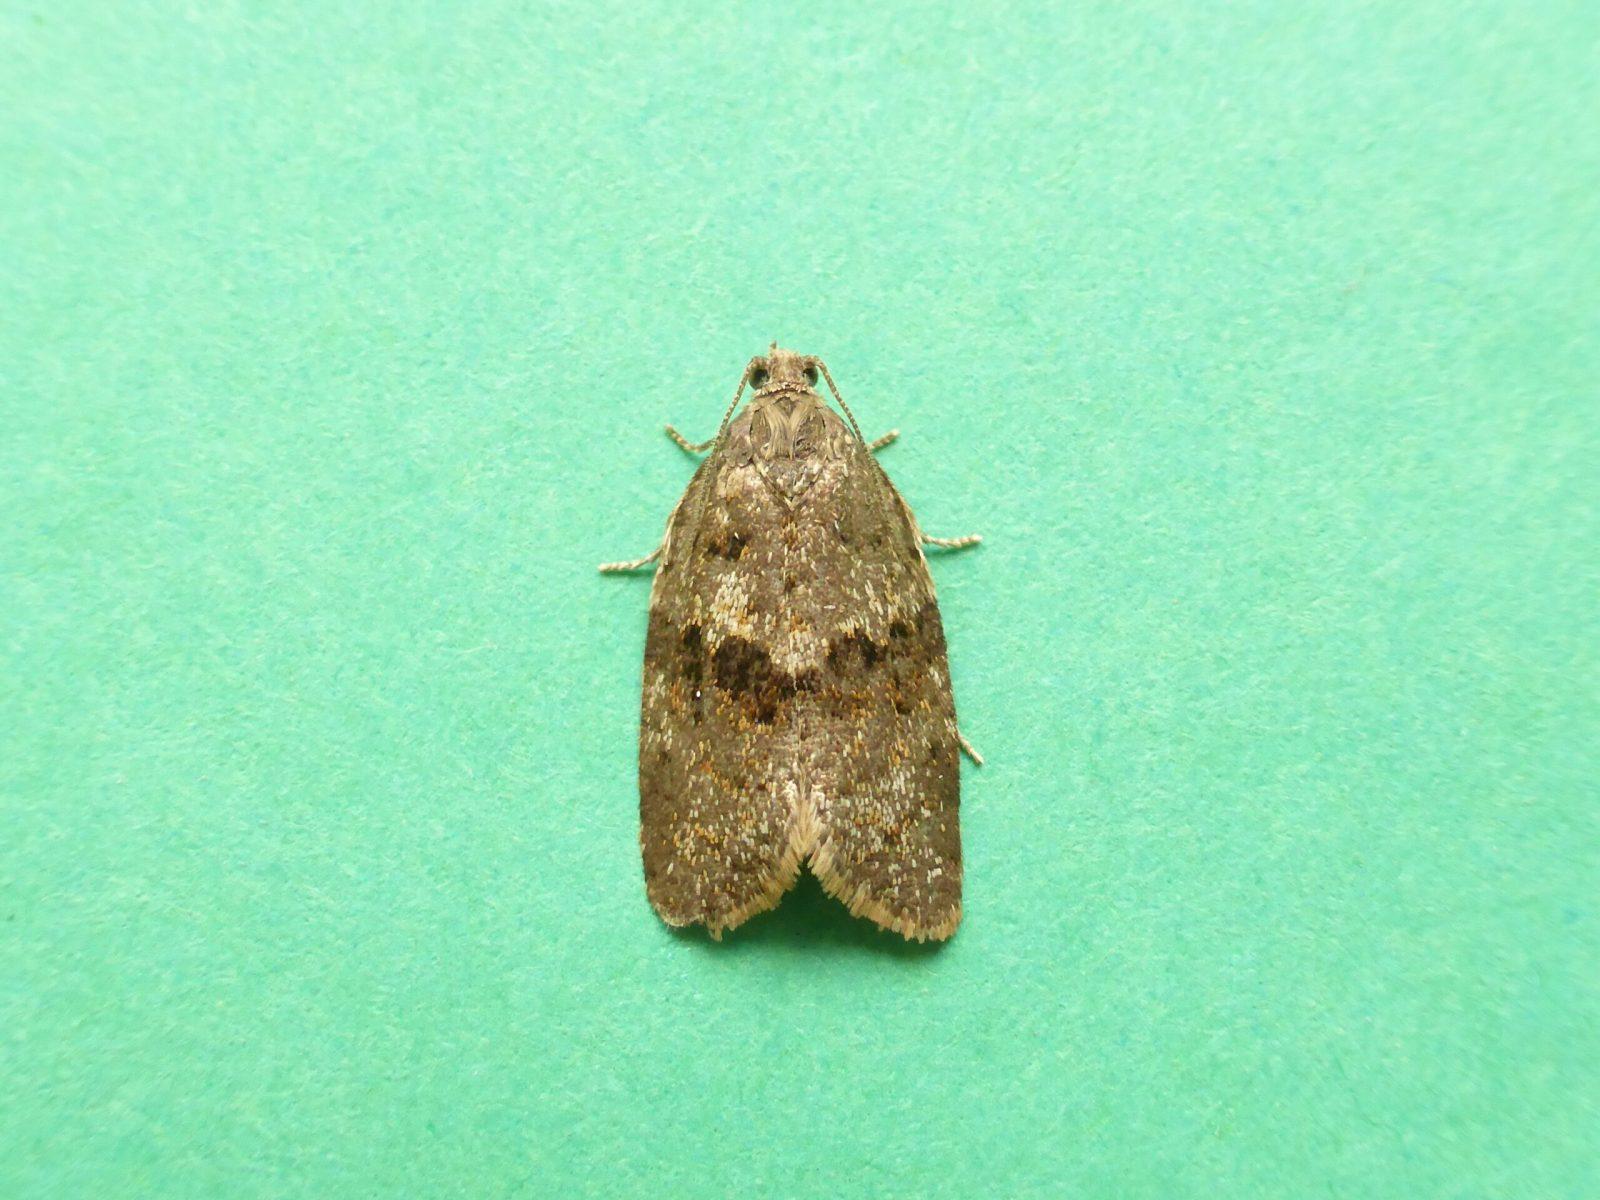 Syndemis musculana - Hatfield Moors